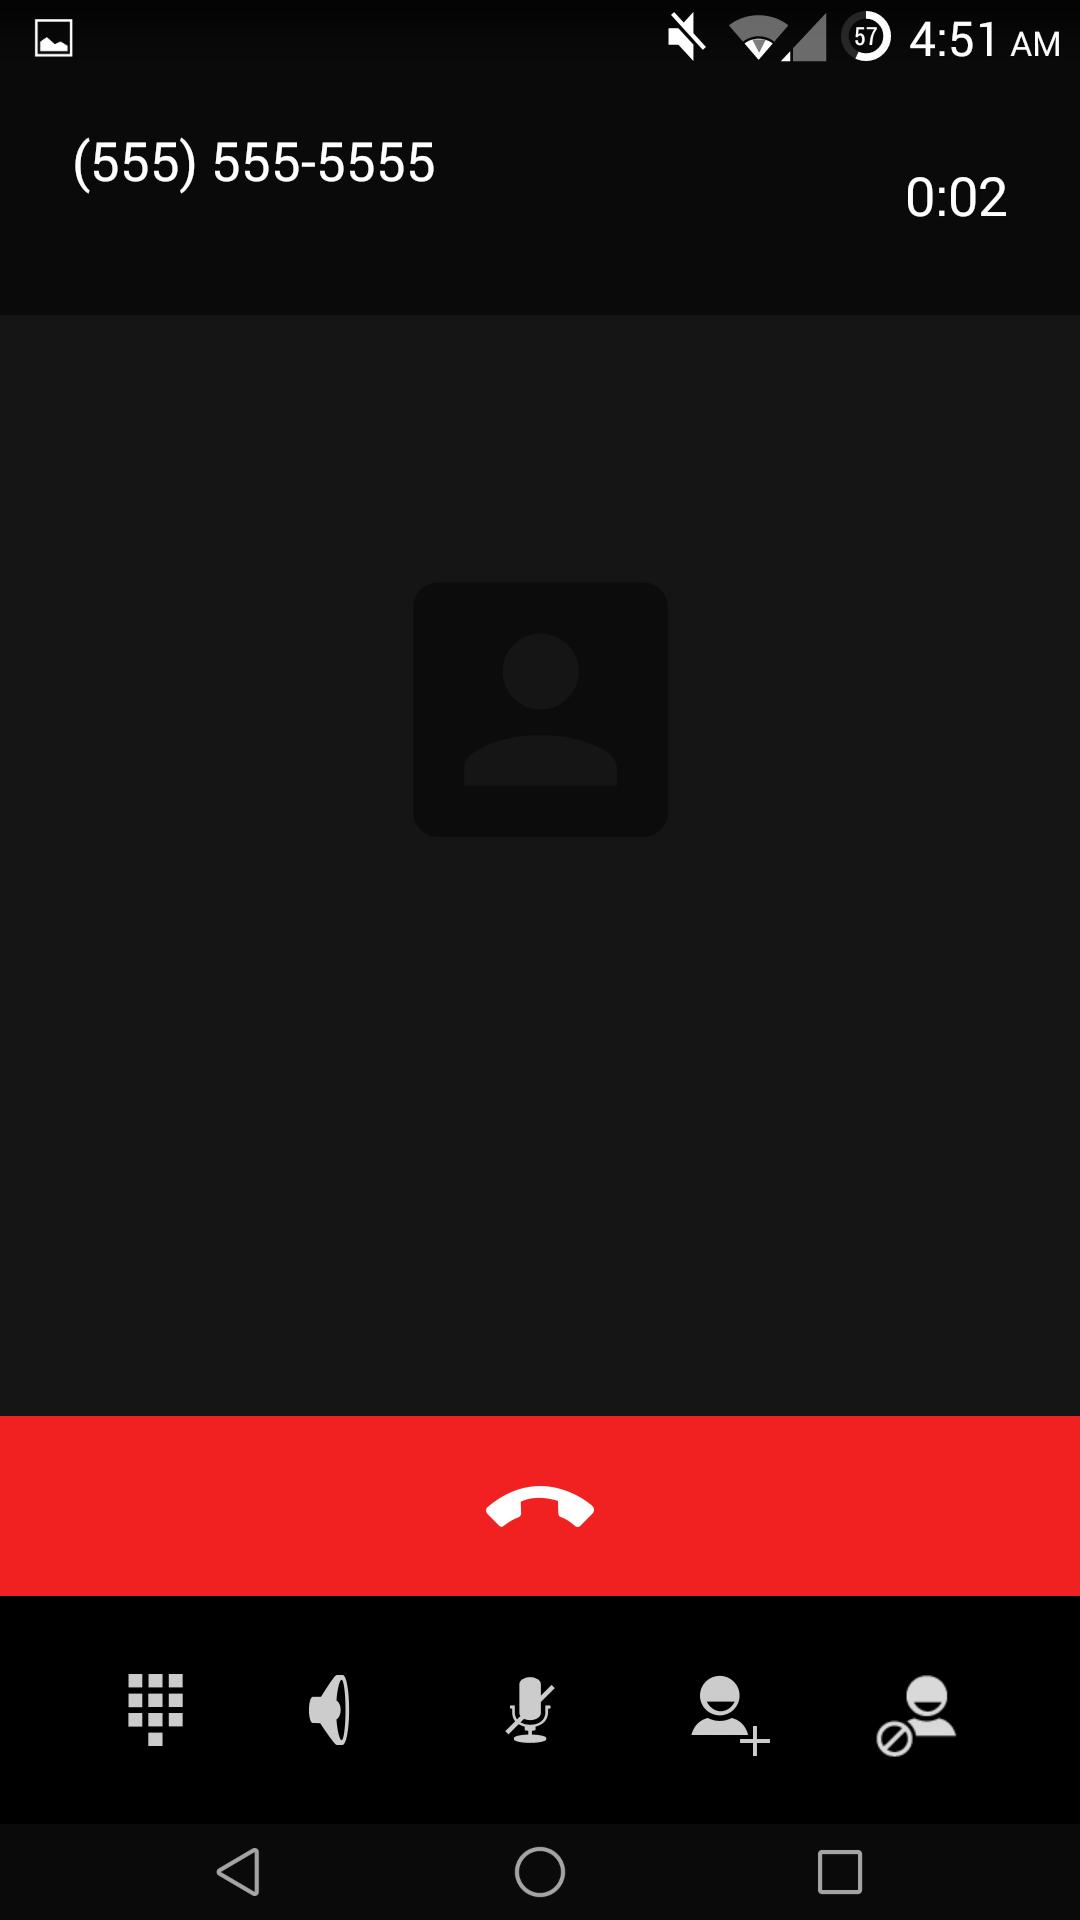 Screenshot_2014-08-28-19-53-00